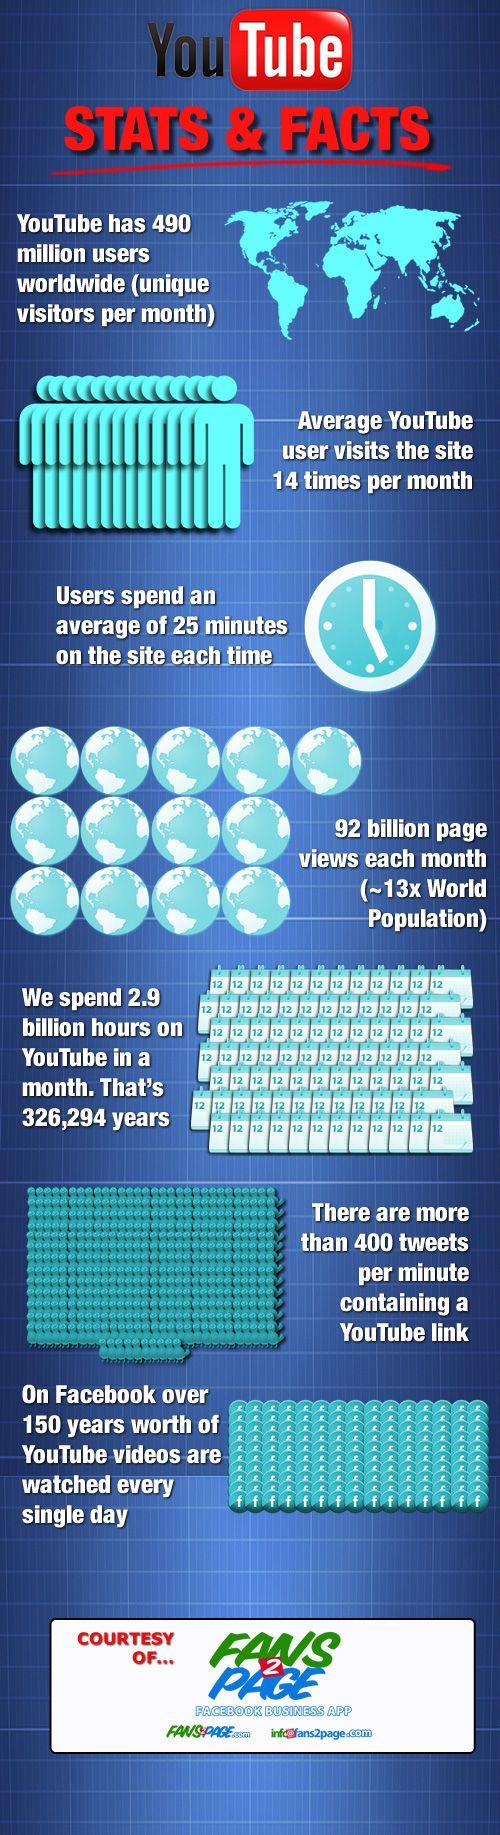 #YouTube Statistik 2013 #onlinemarketing #onlinePR #PR